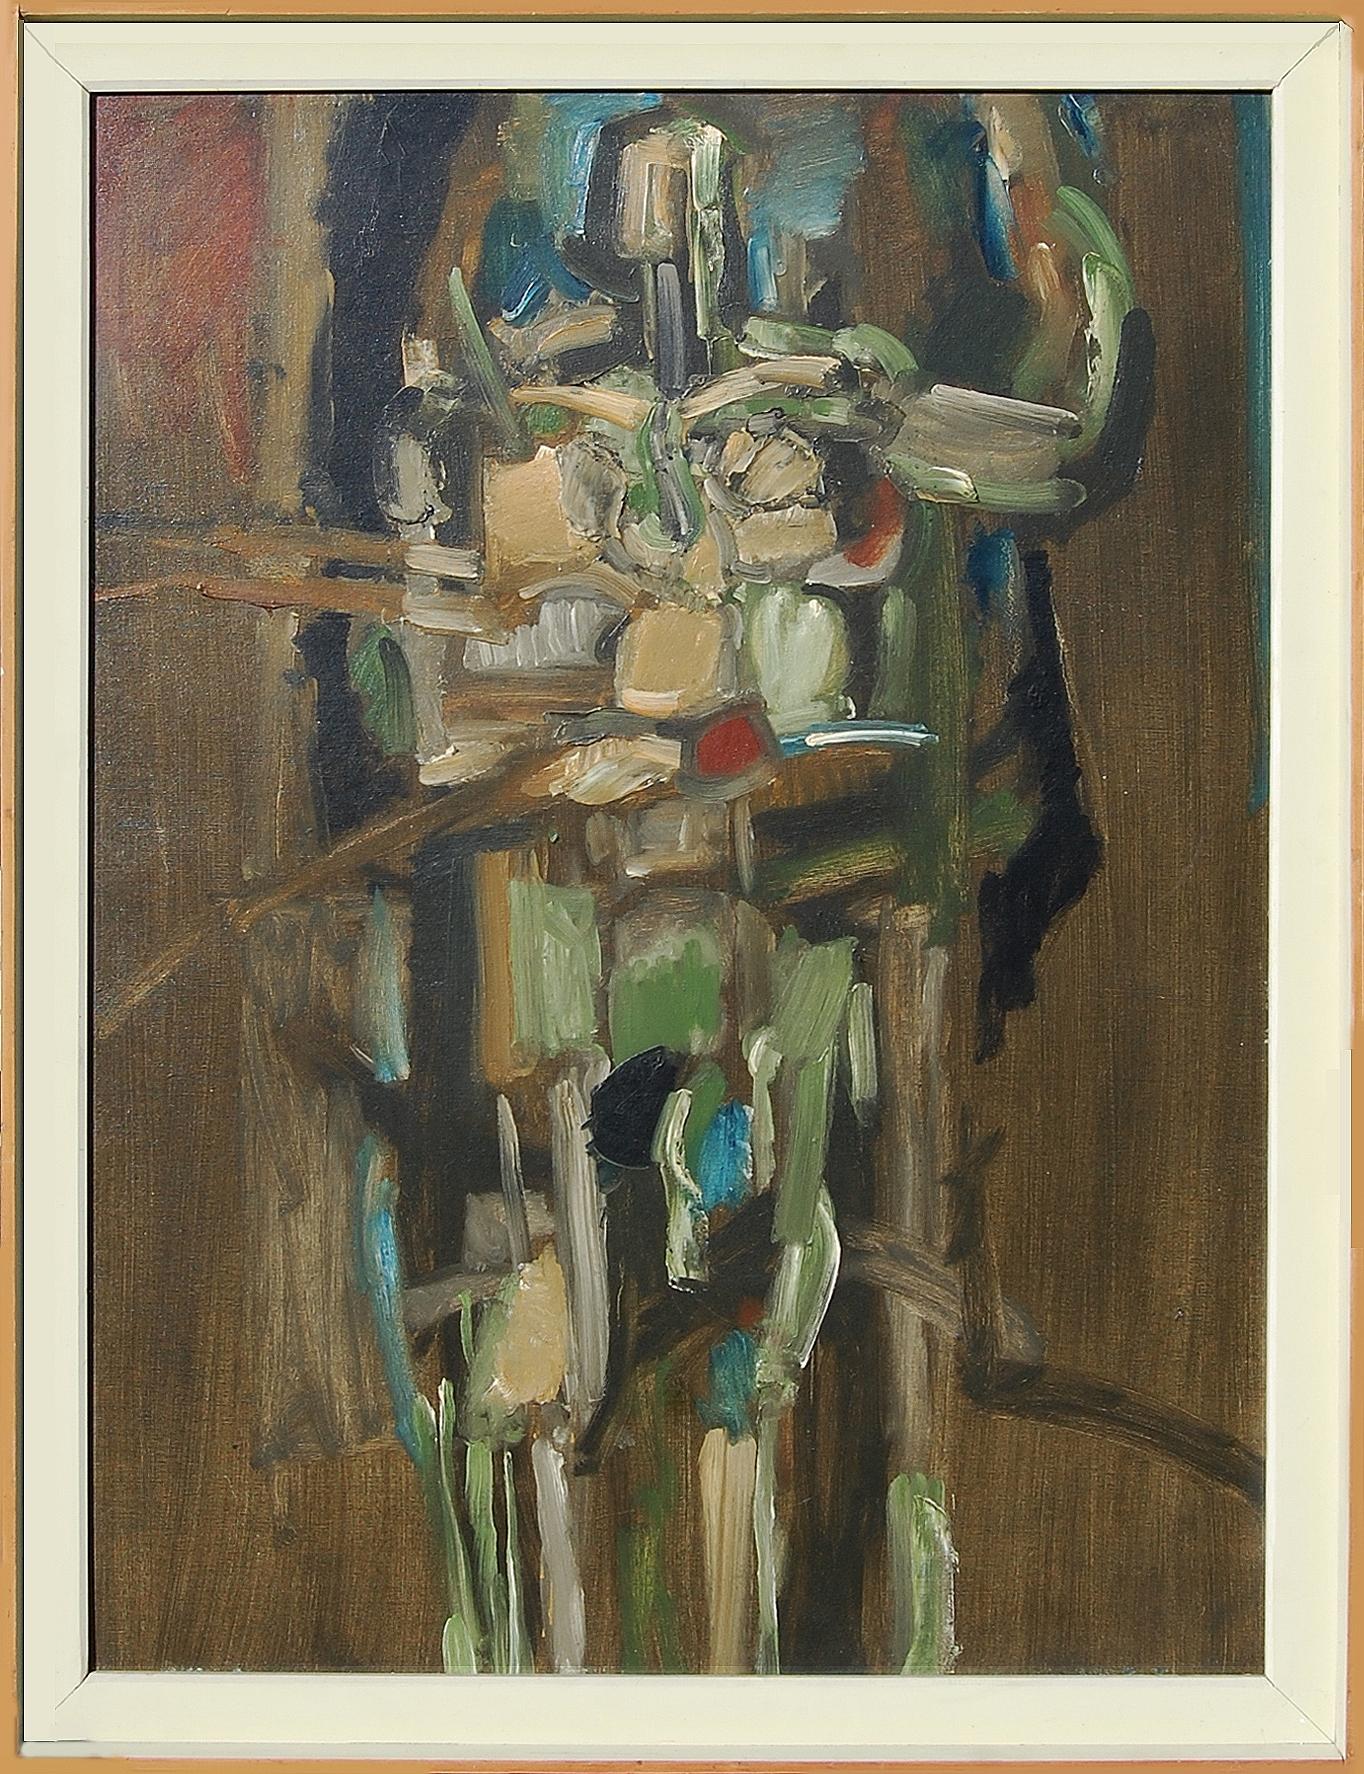 Medieval Warrior, Bob Crossley, 1959, Castlegate House Gallery